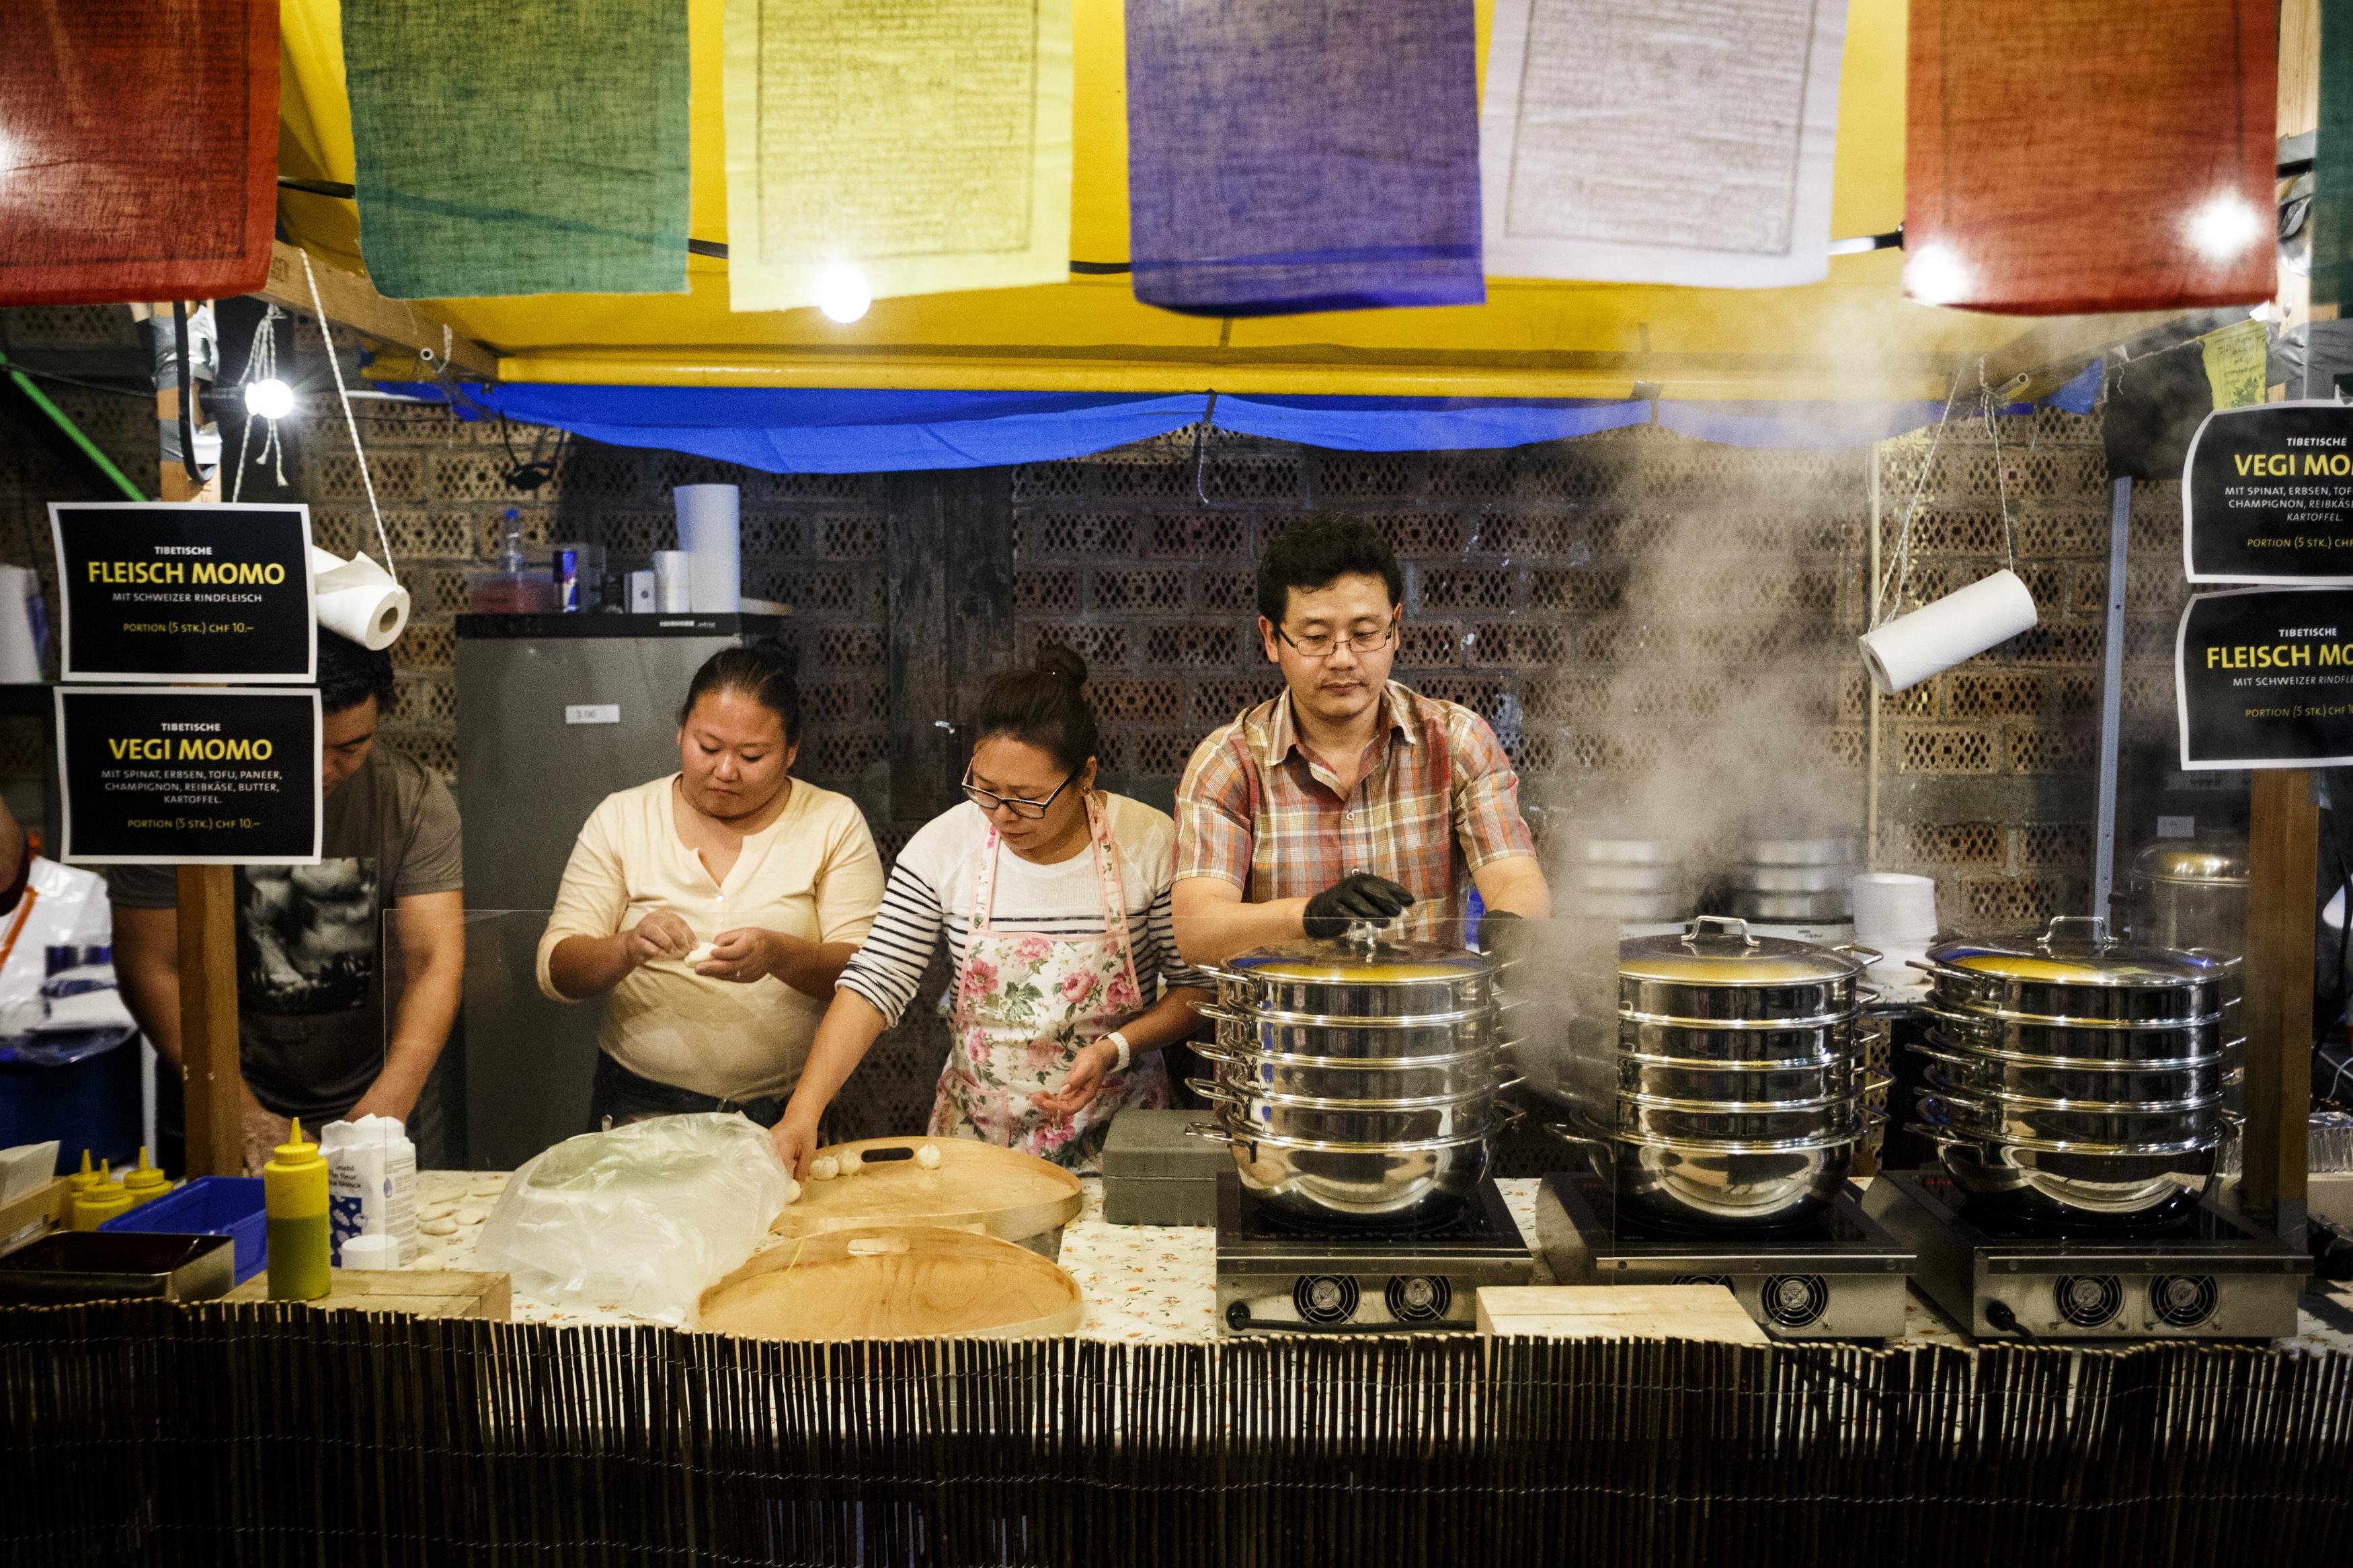 7. Street Food Festival Uster